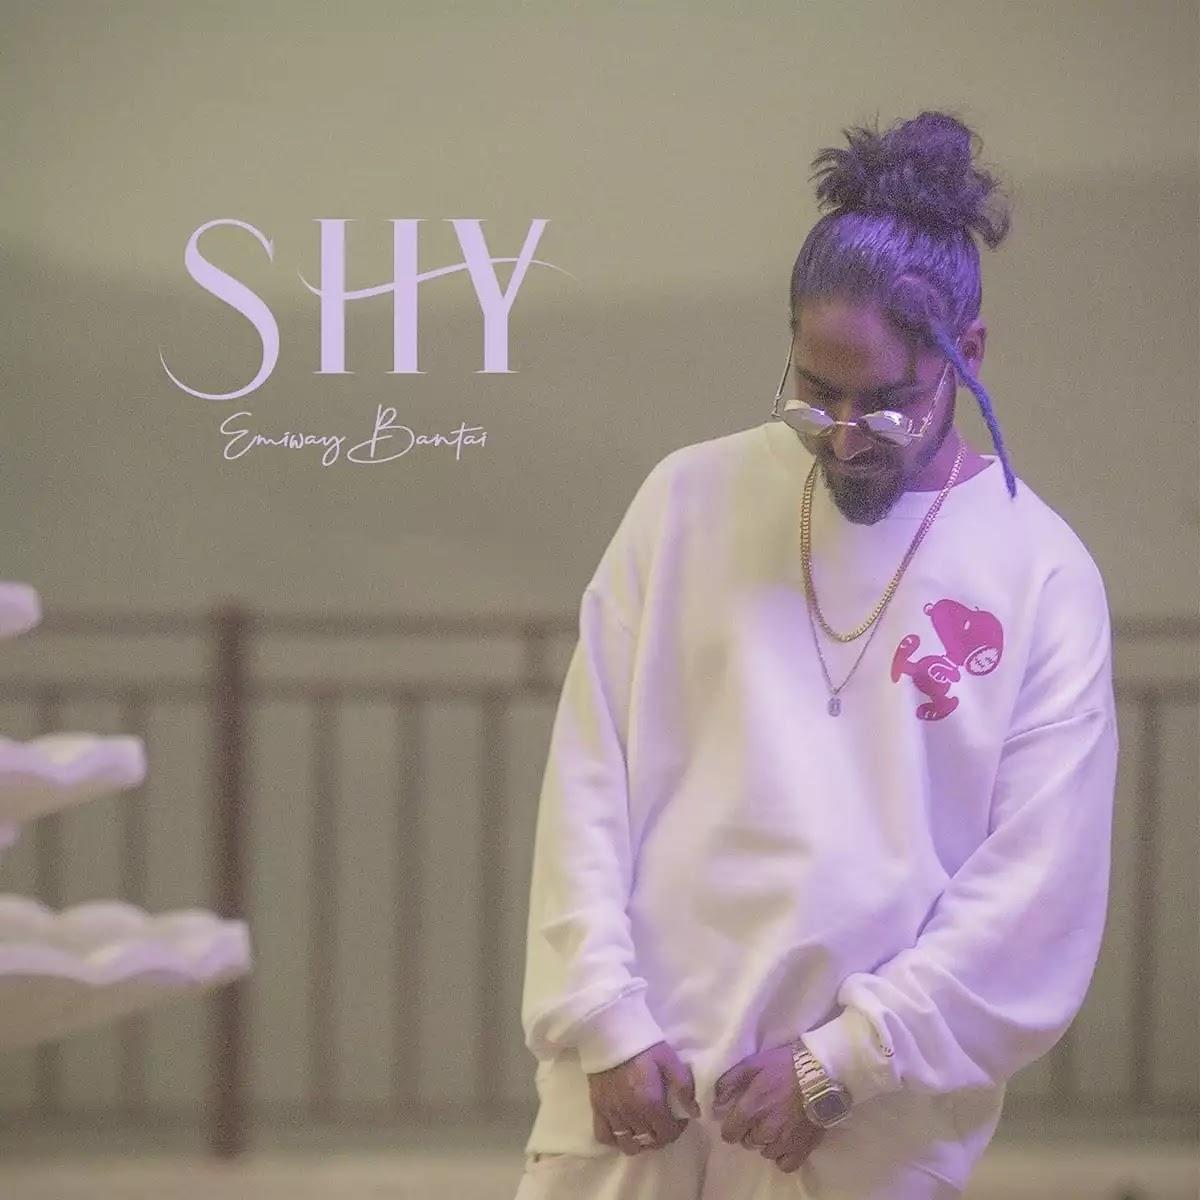 Shy Emiway Bantai MP3 Song Download 320kbps